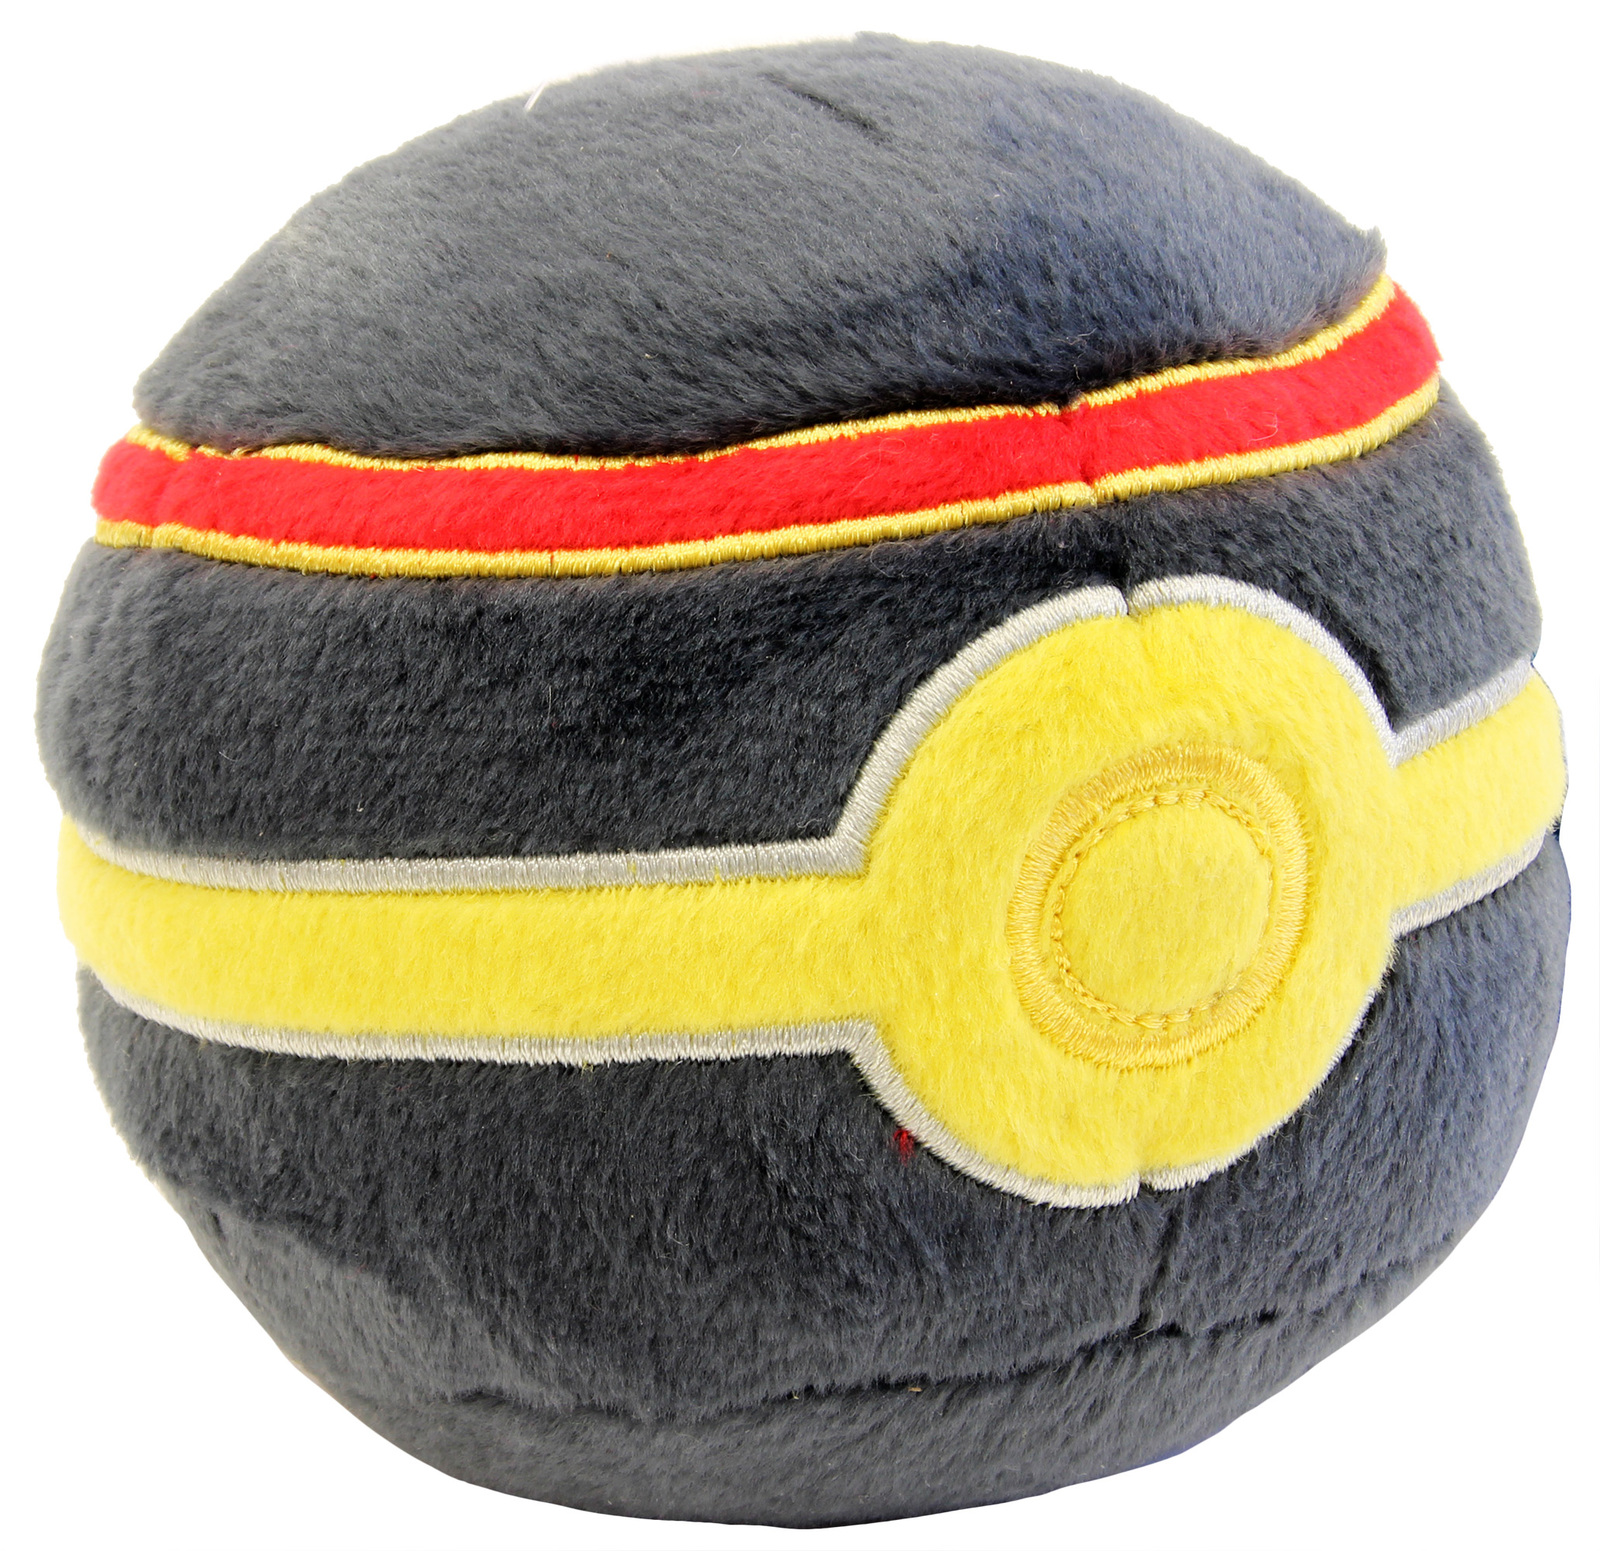 "Pokémon - 5"" Luxury-Ball Plush image"